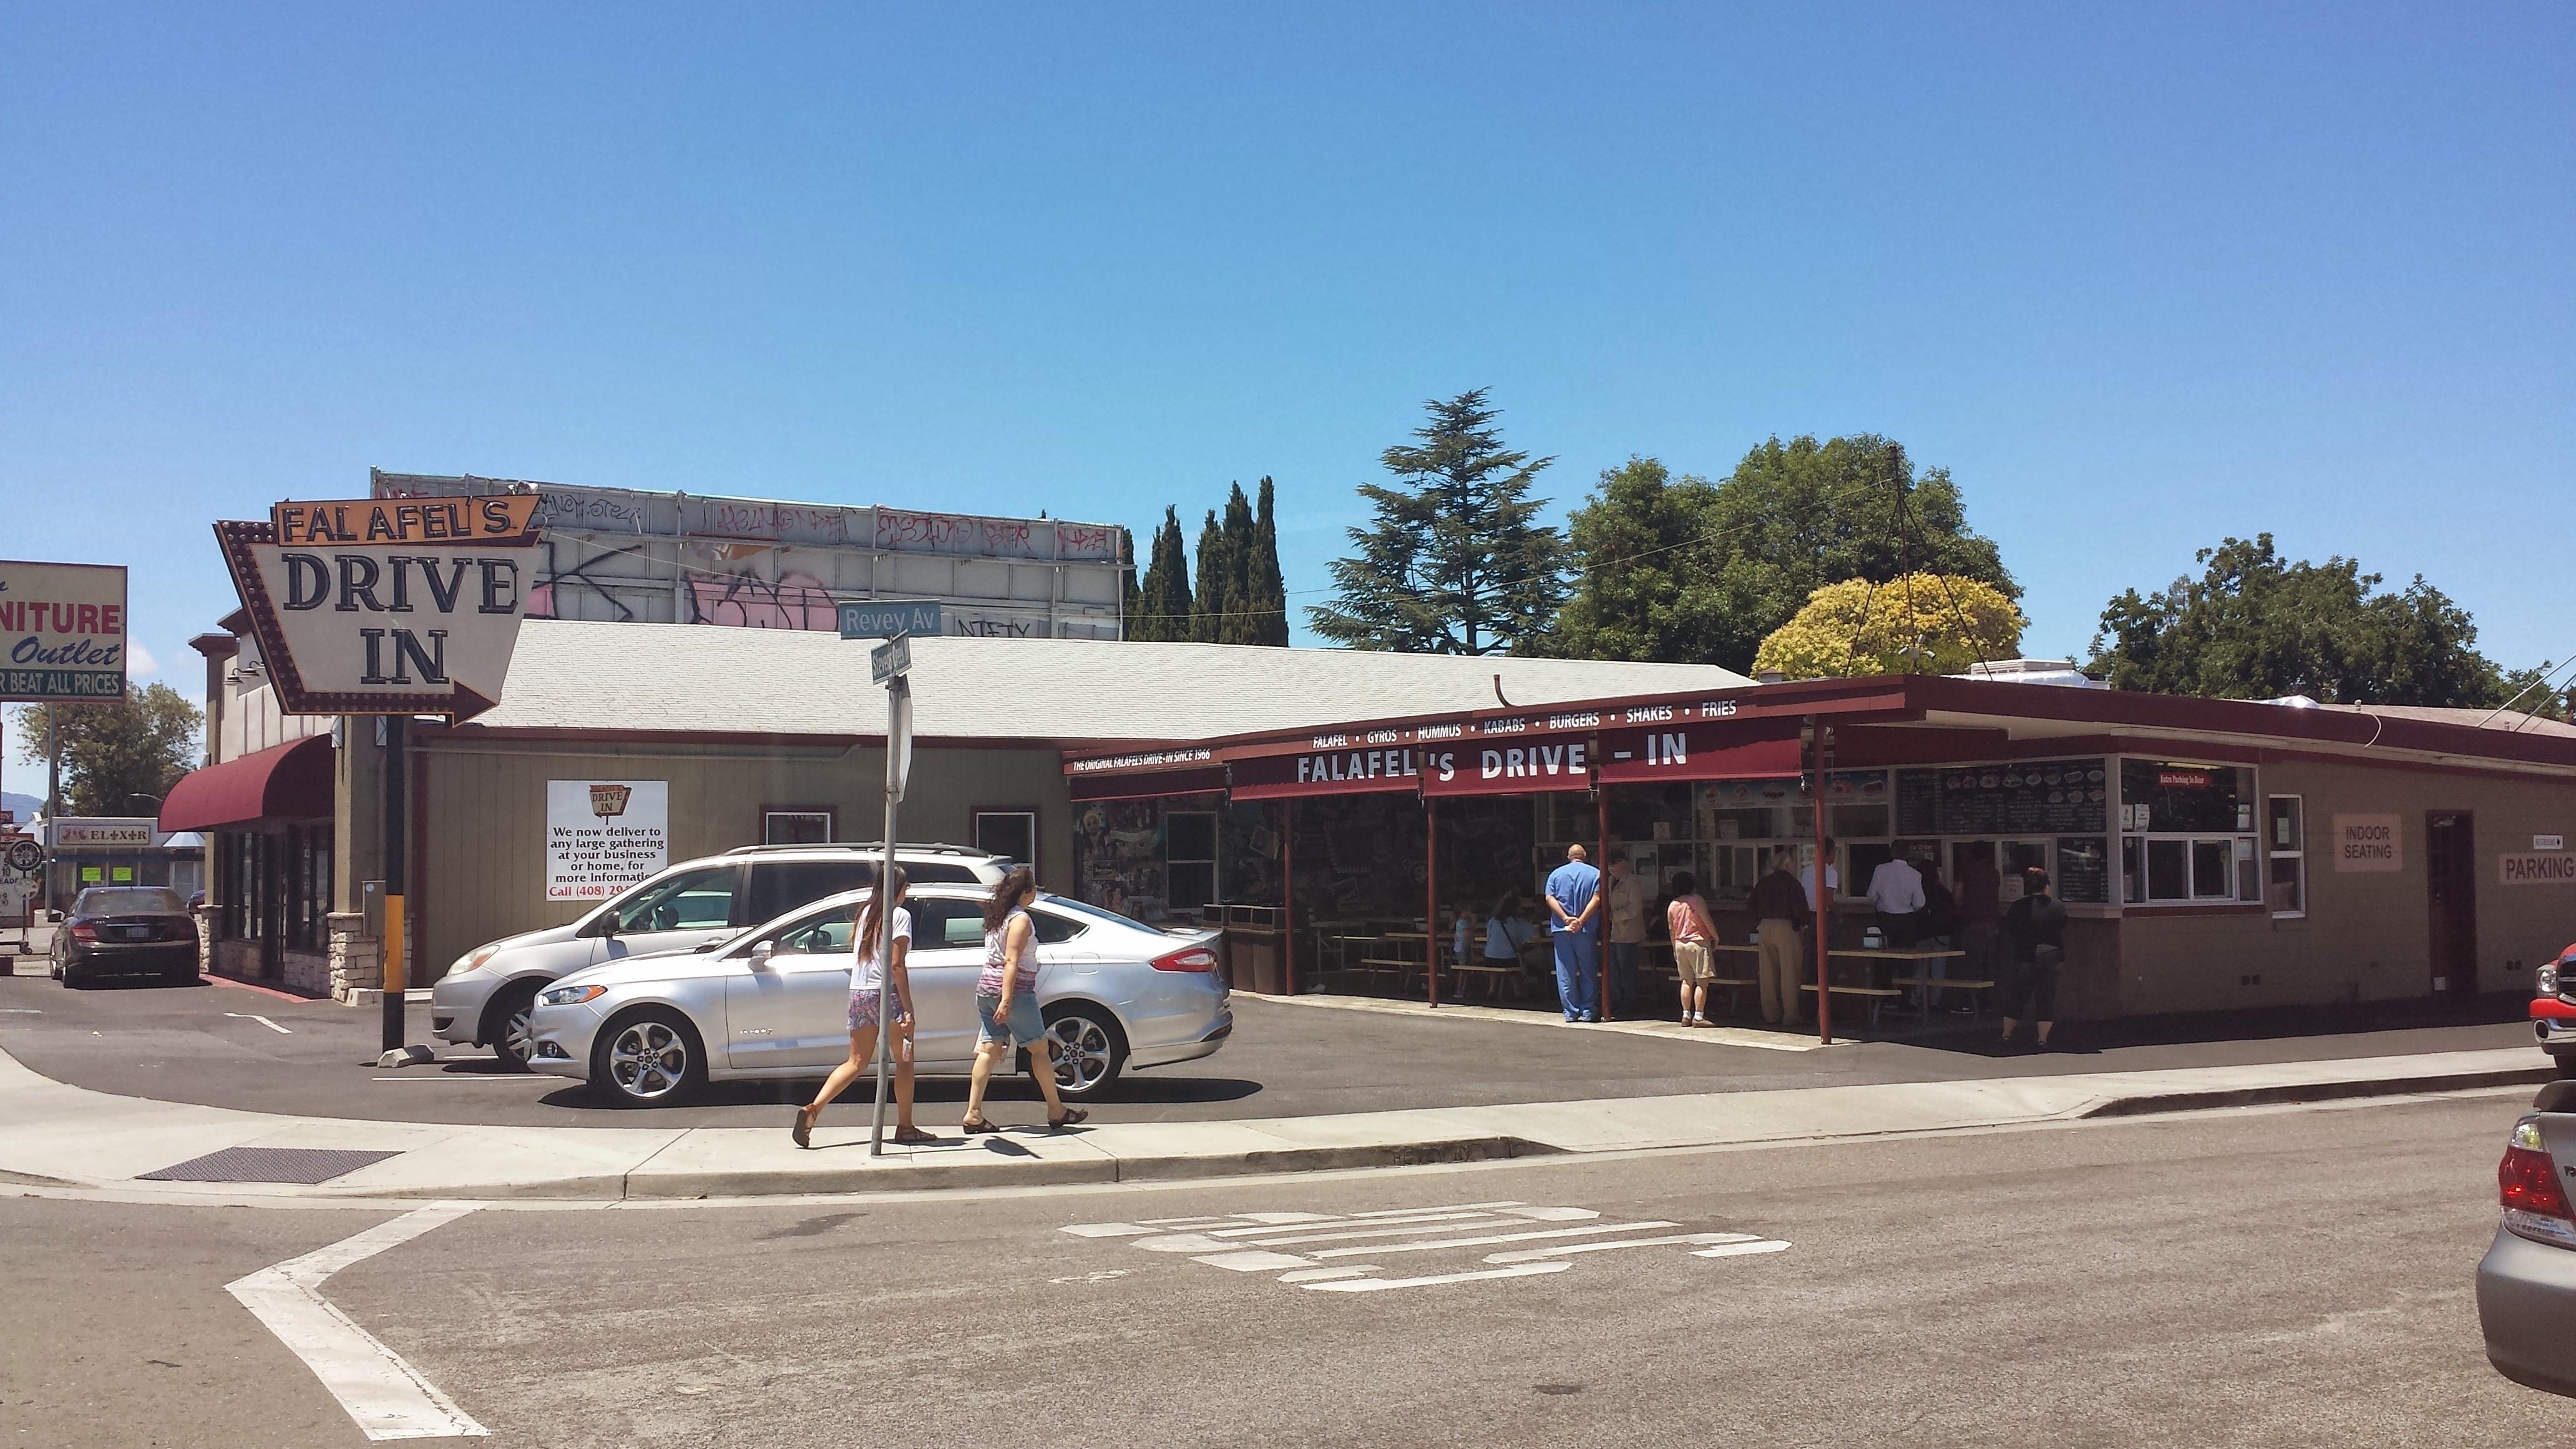 Falafel's Drive-In